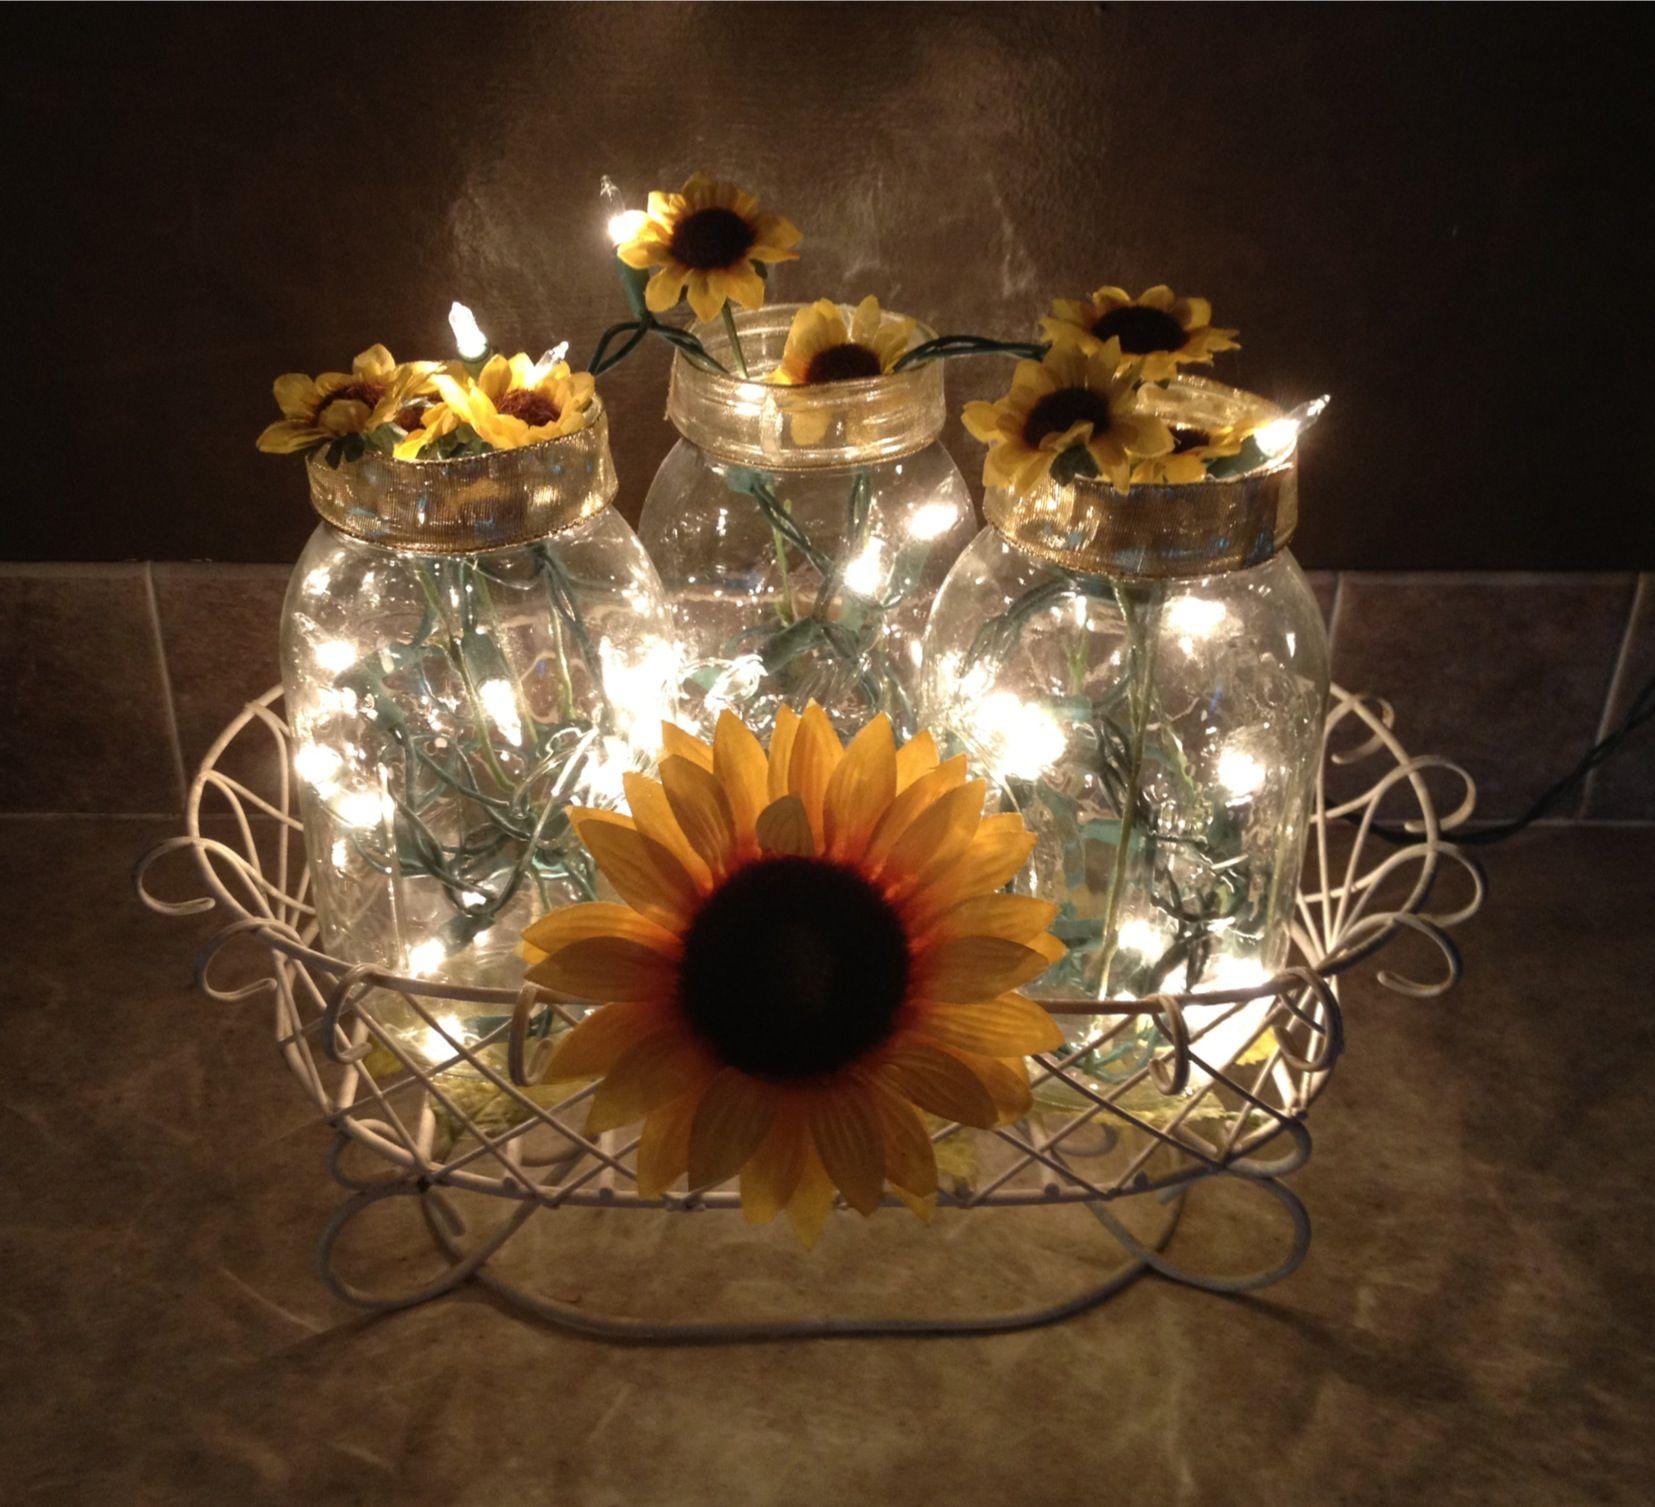 17 best ideas about sunflower themed kitchen on pinterest